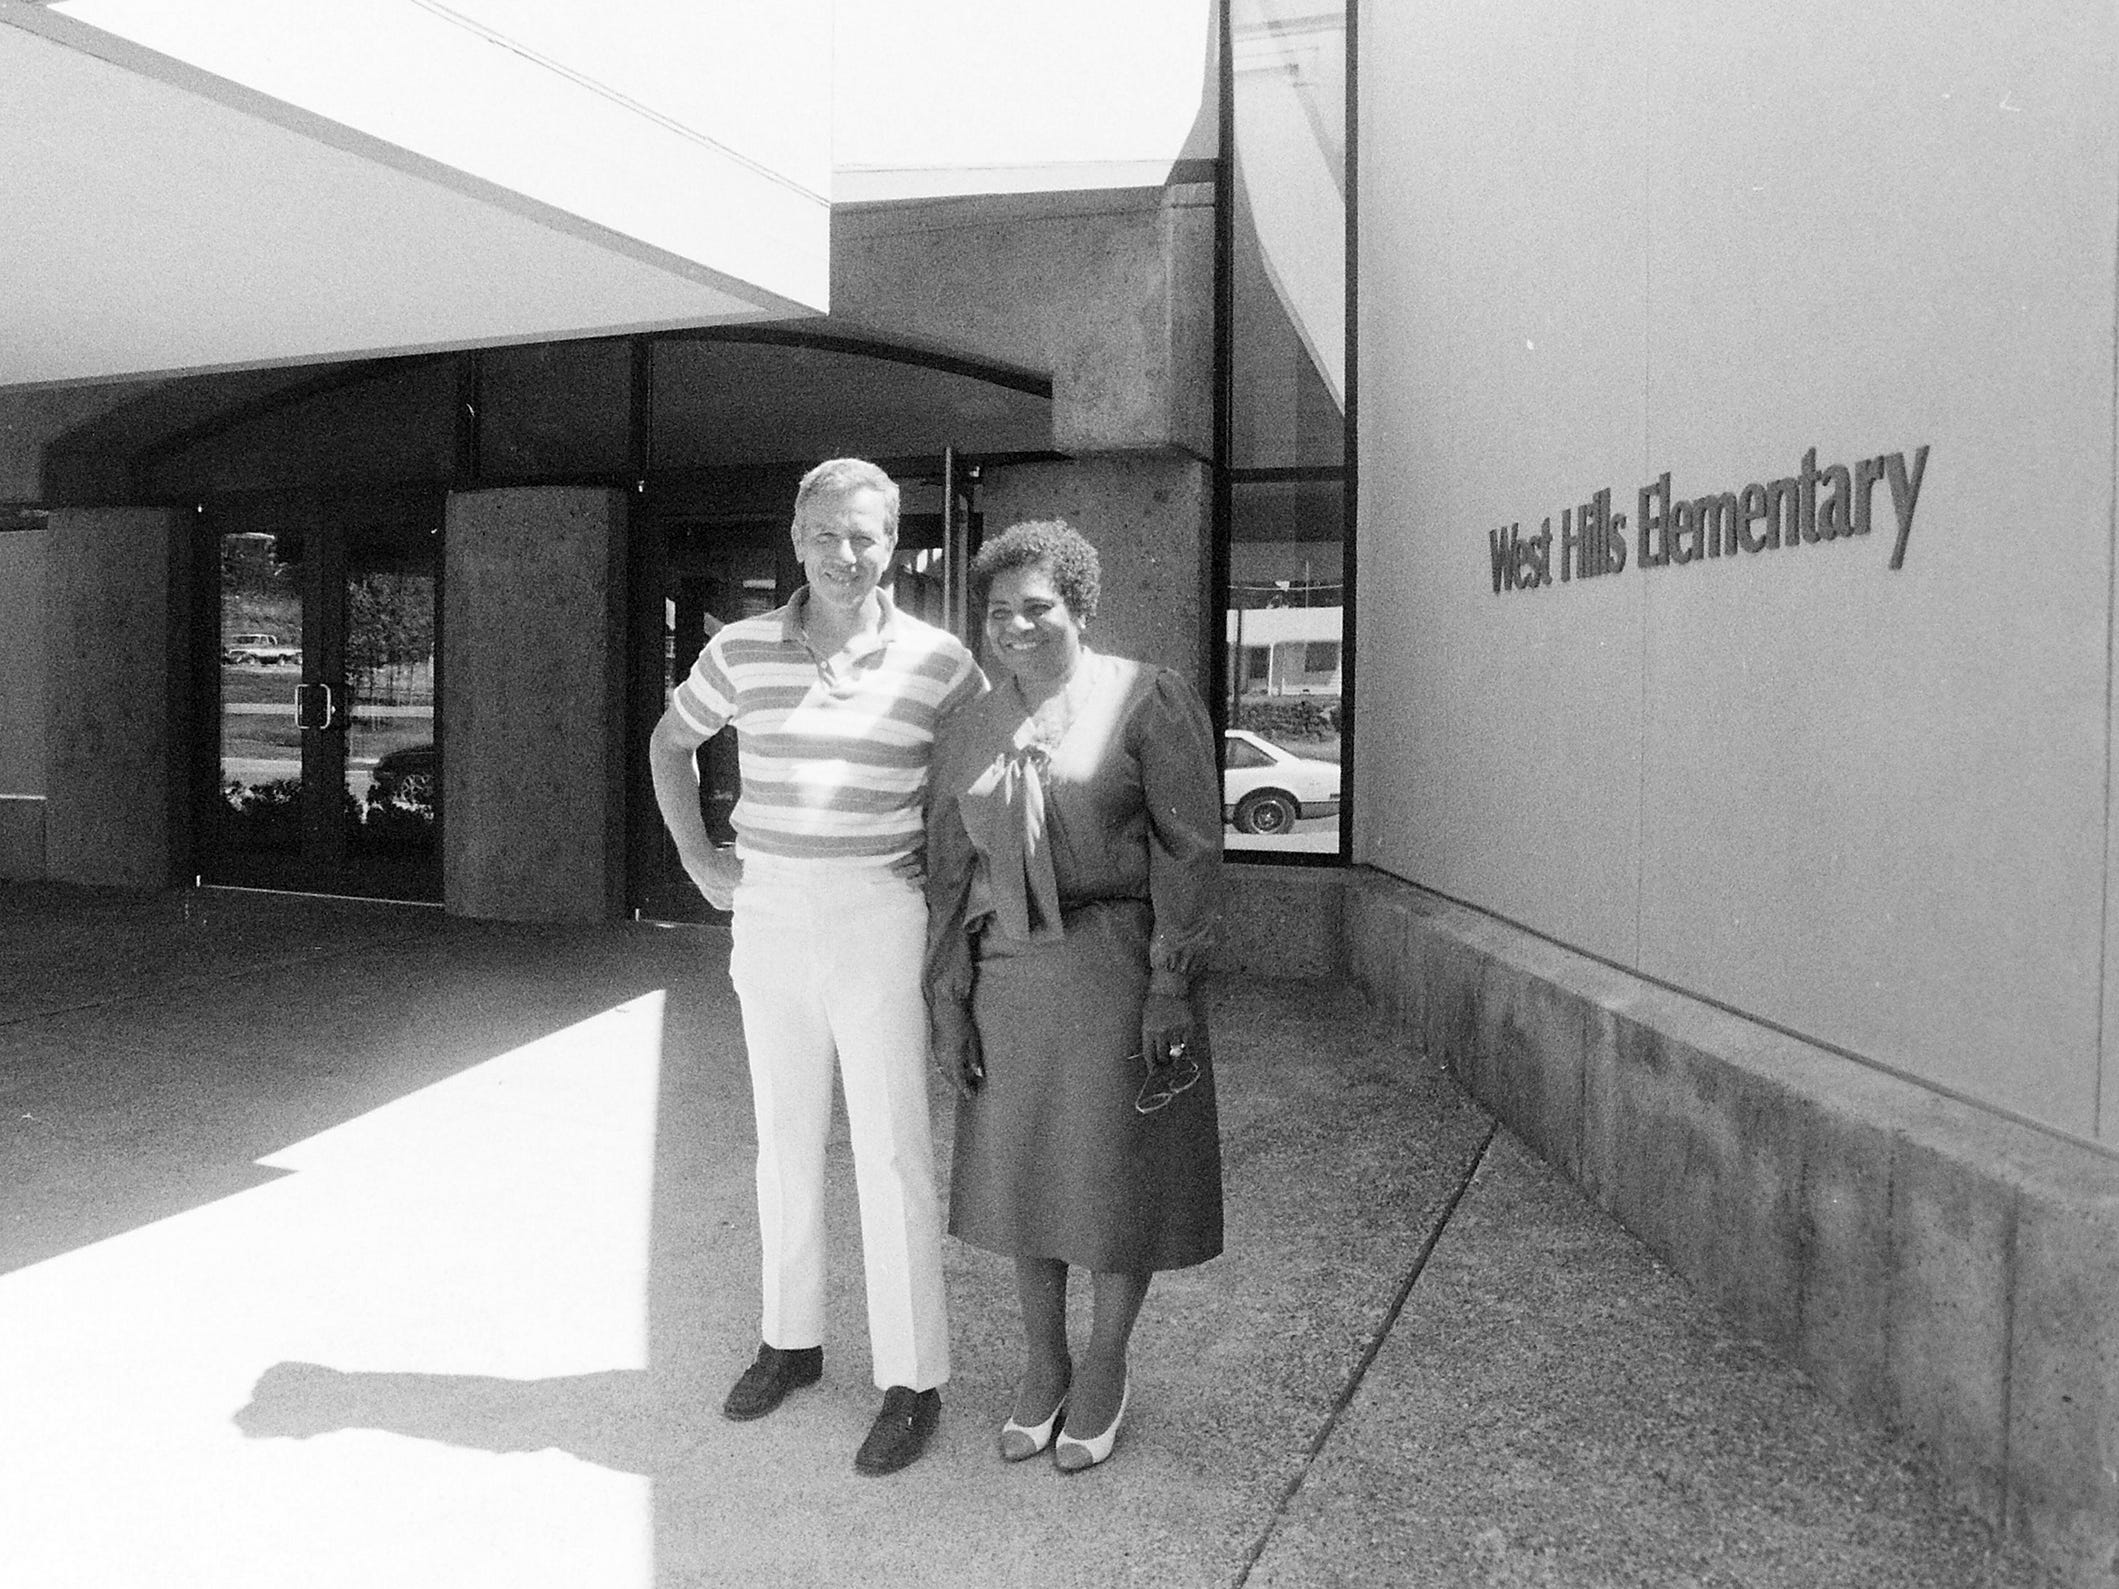 08/02/88Bremerton Schools